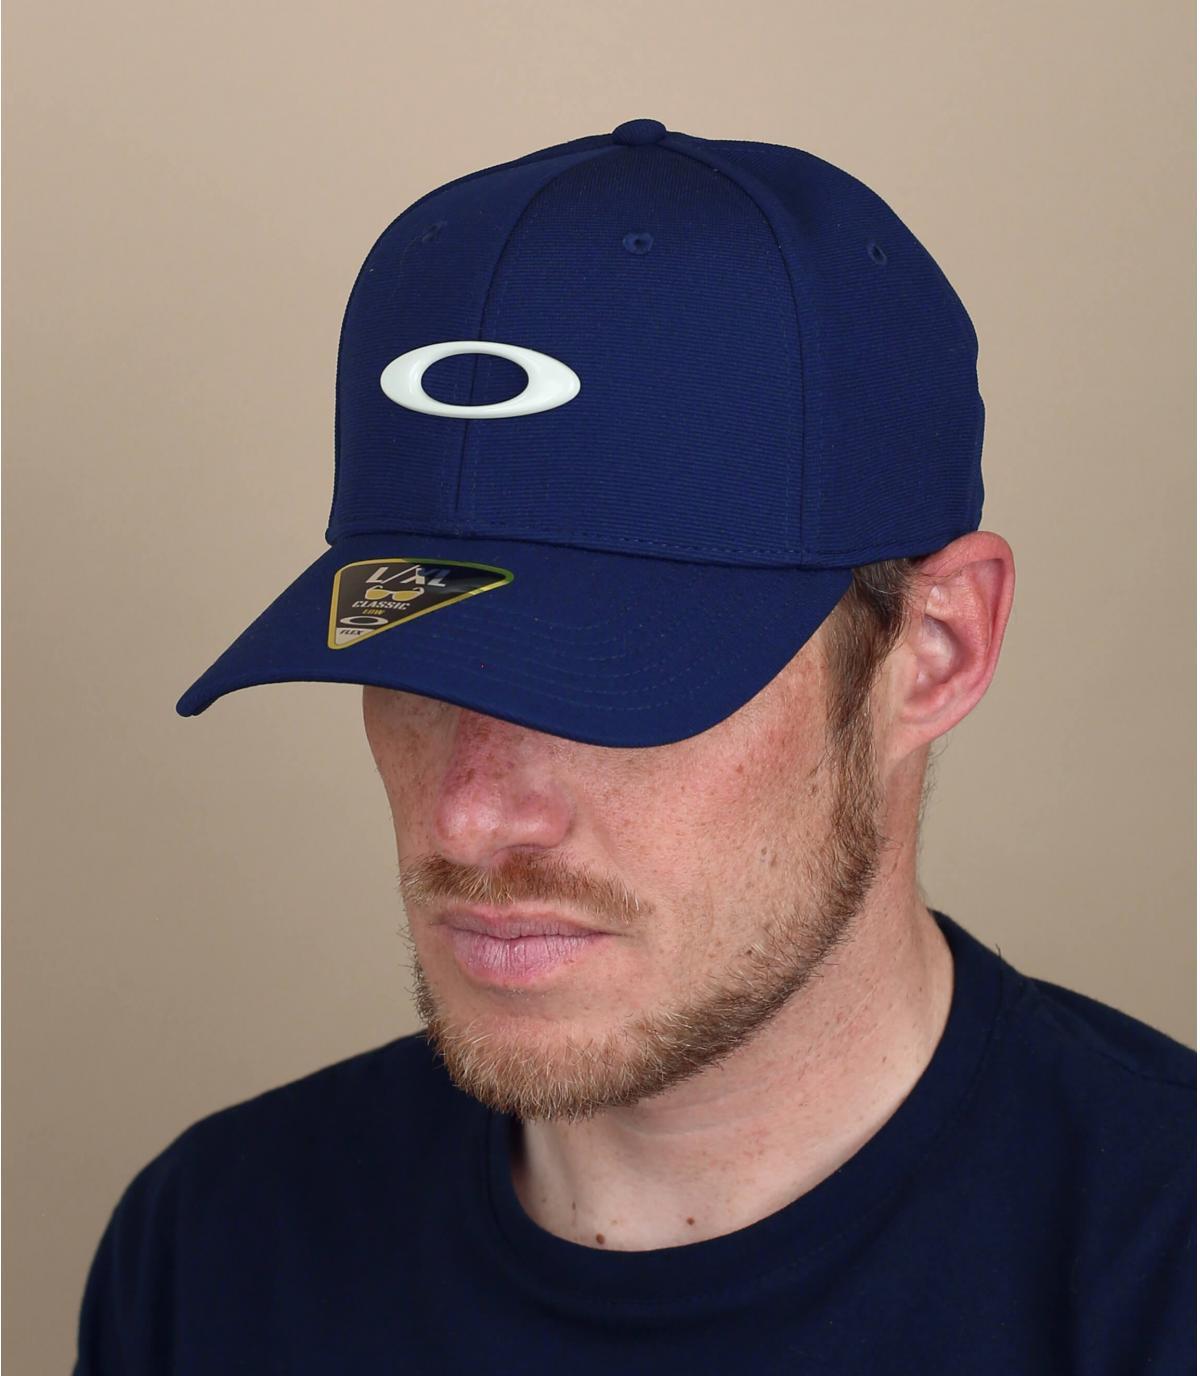 gorra Oakley azul marino